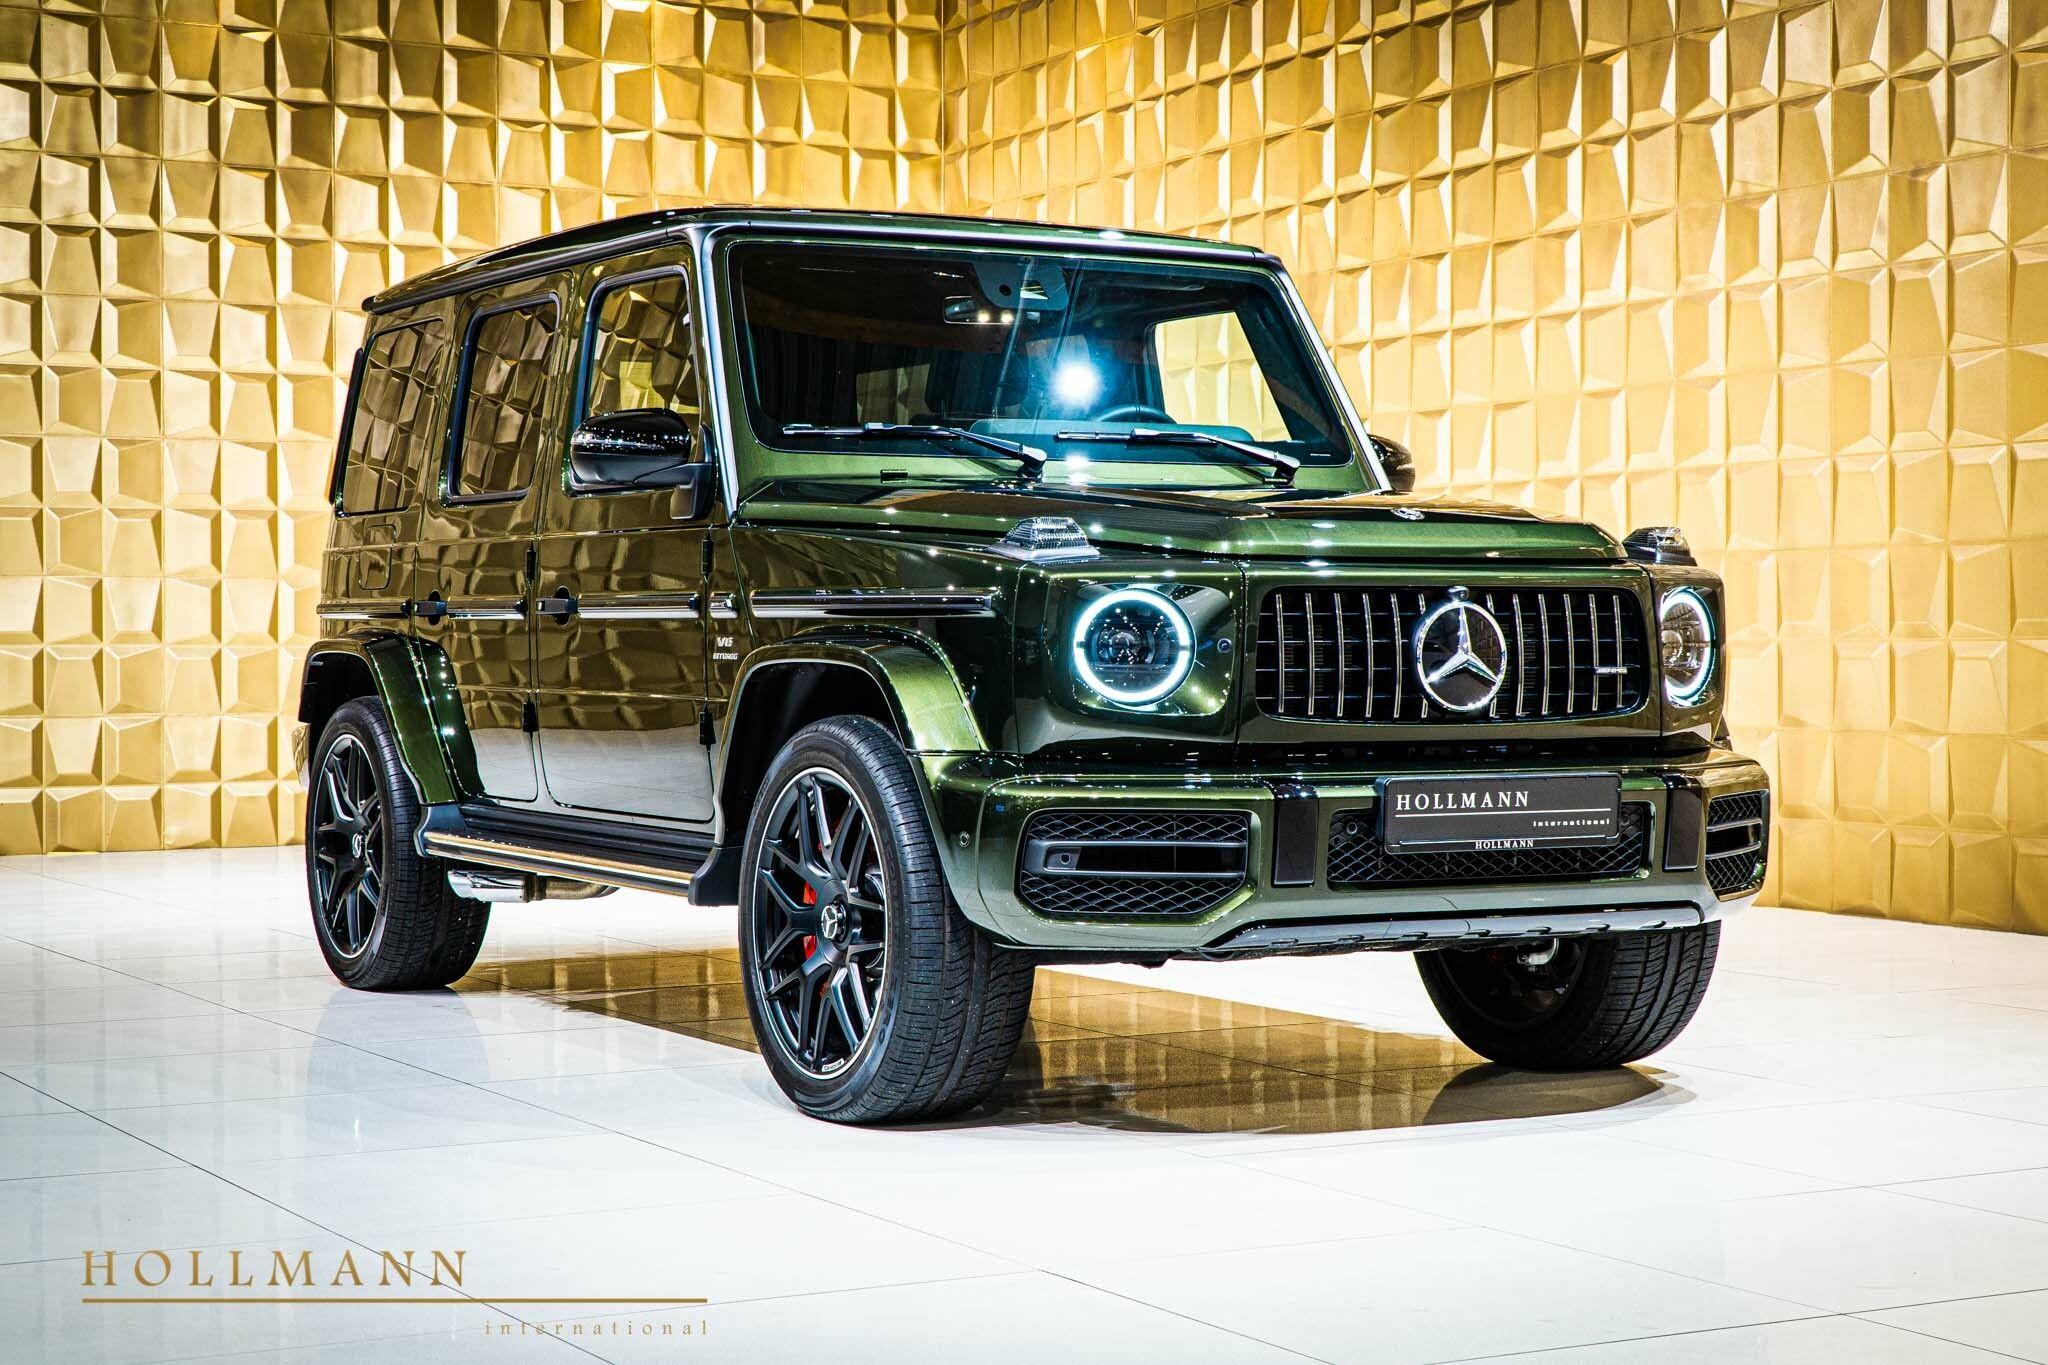 Mercedes Benz G 63 Amg Hollmann International Germany For Sale On Luxurypulse Benz G Mercedes Benz Benz